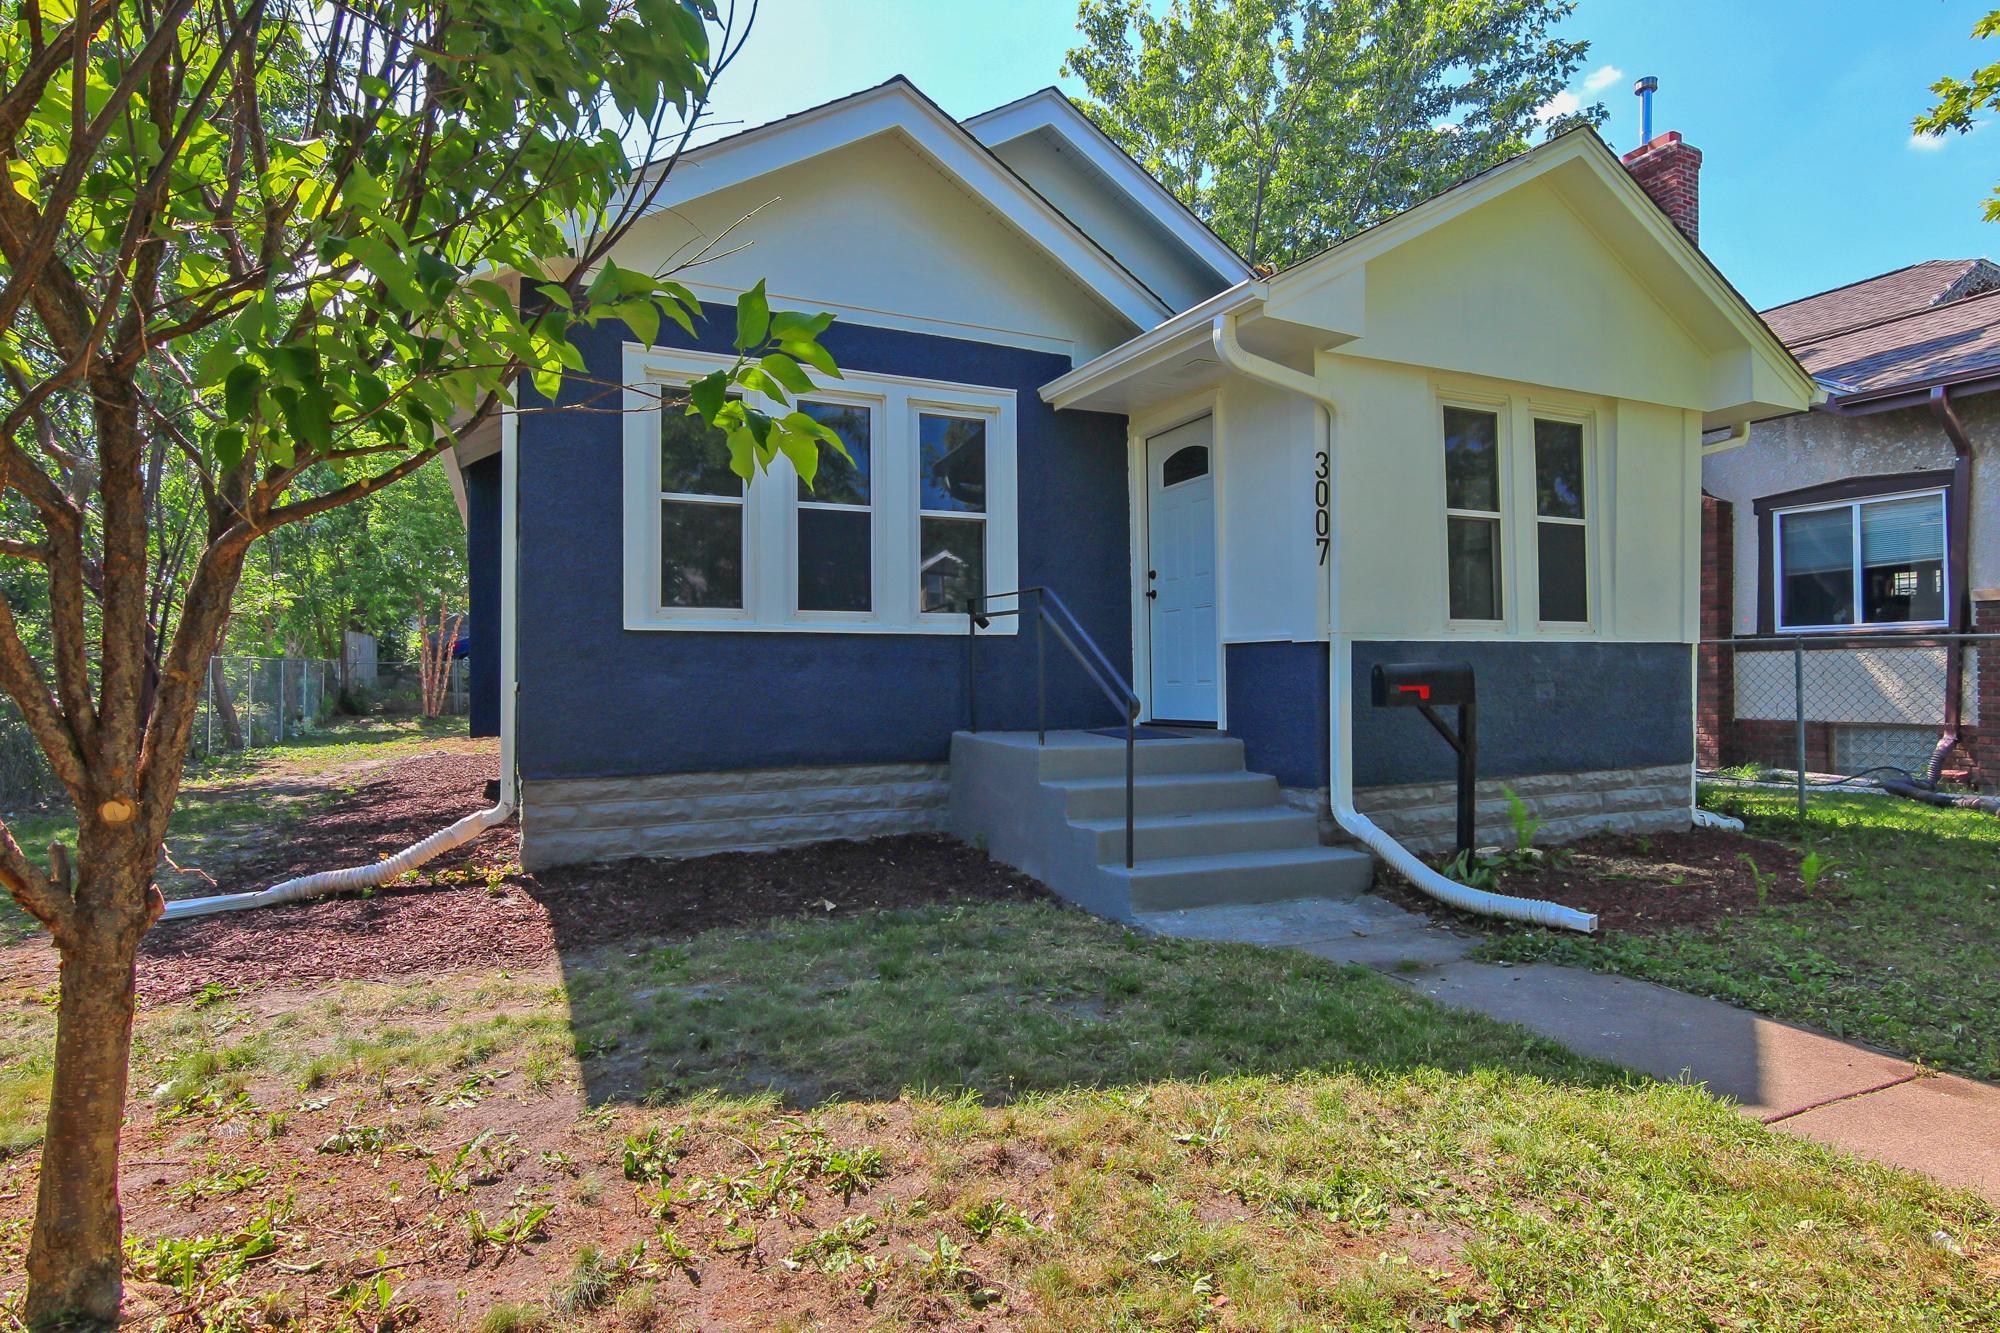 3007 Logan N Property Photo - Minneapolis, MN real estate listing